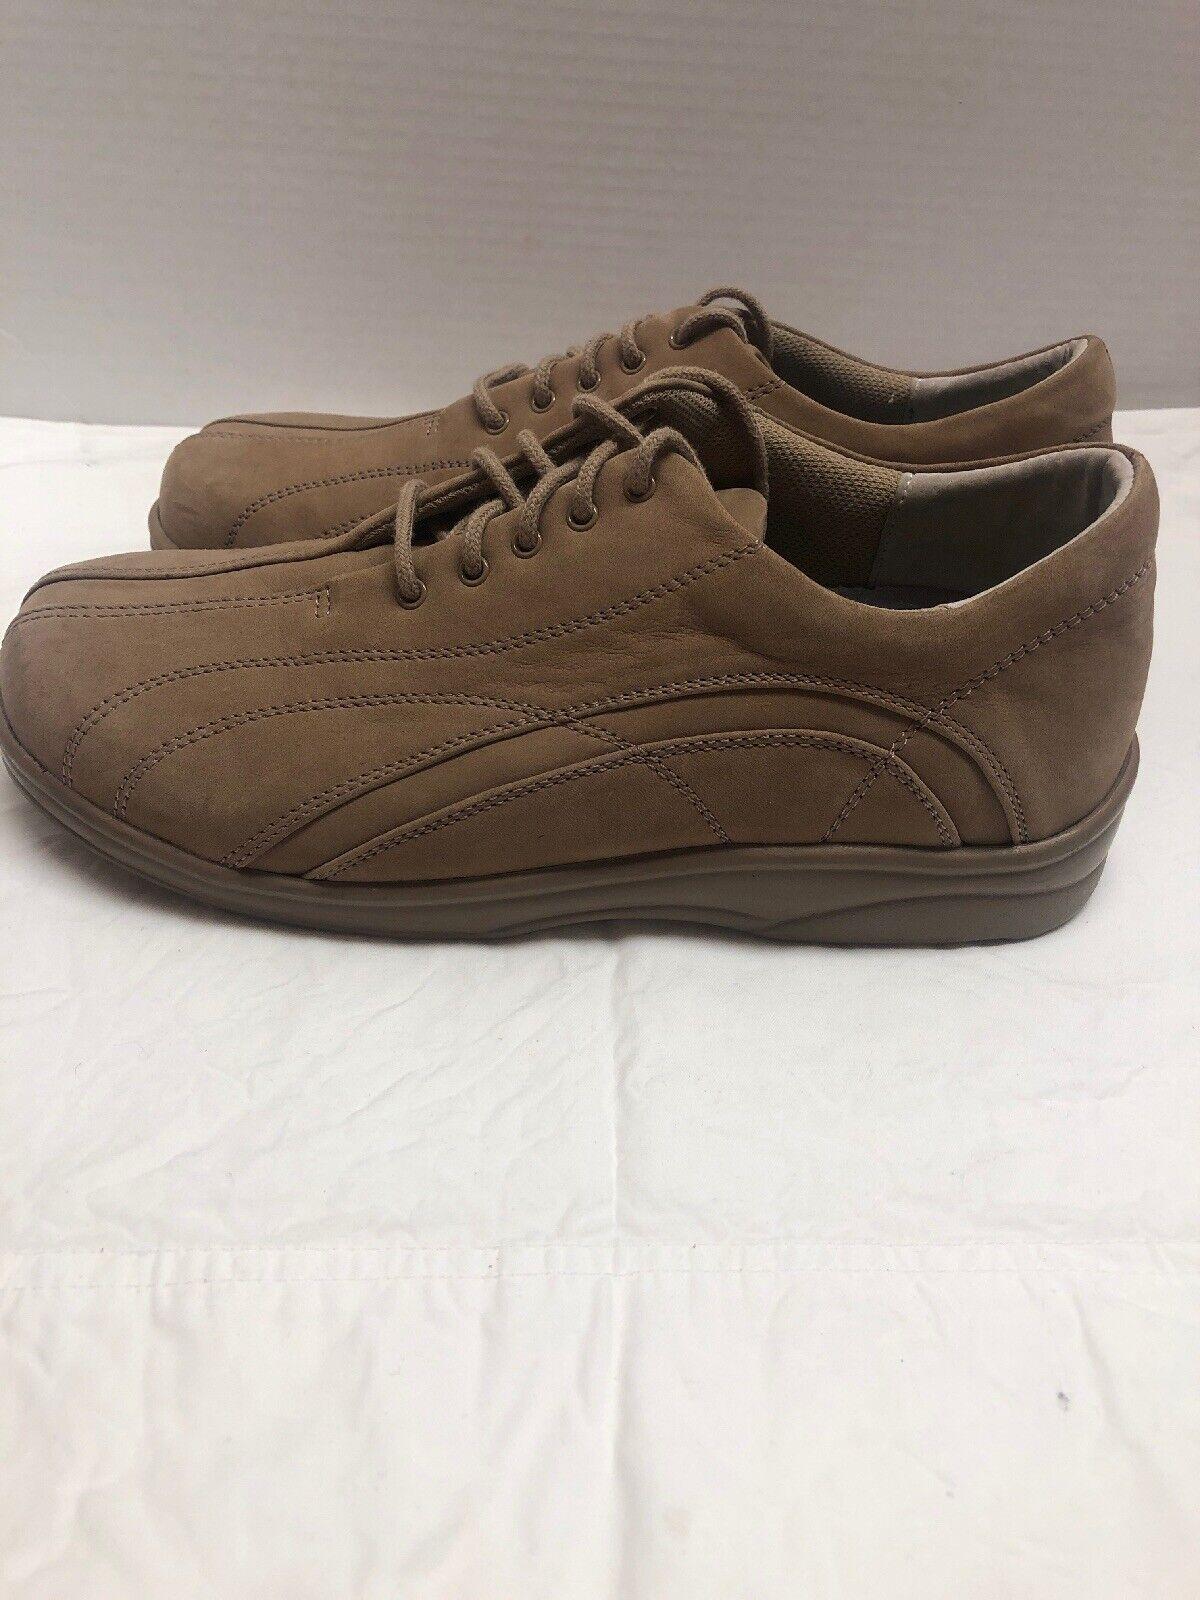 Aetrex Apex Womens Shoe Oxford Nubuck Leather Beige Comfort Diabetic sz 8 Y790W